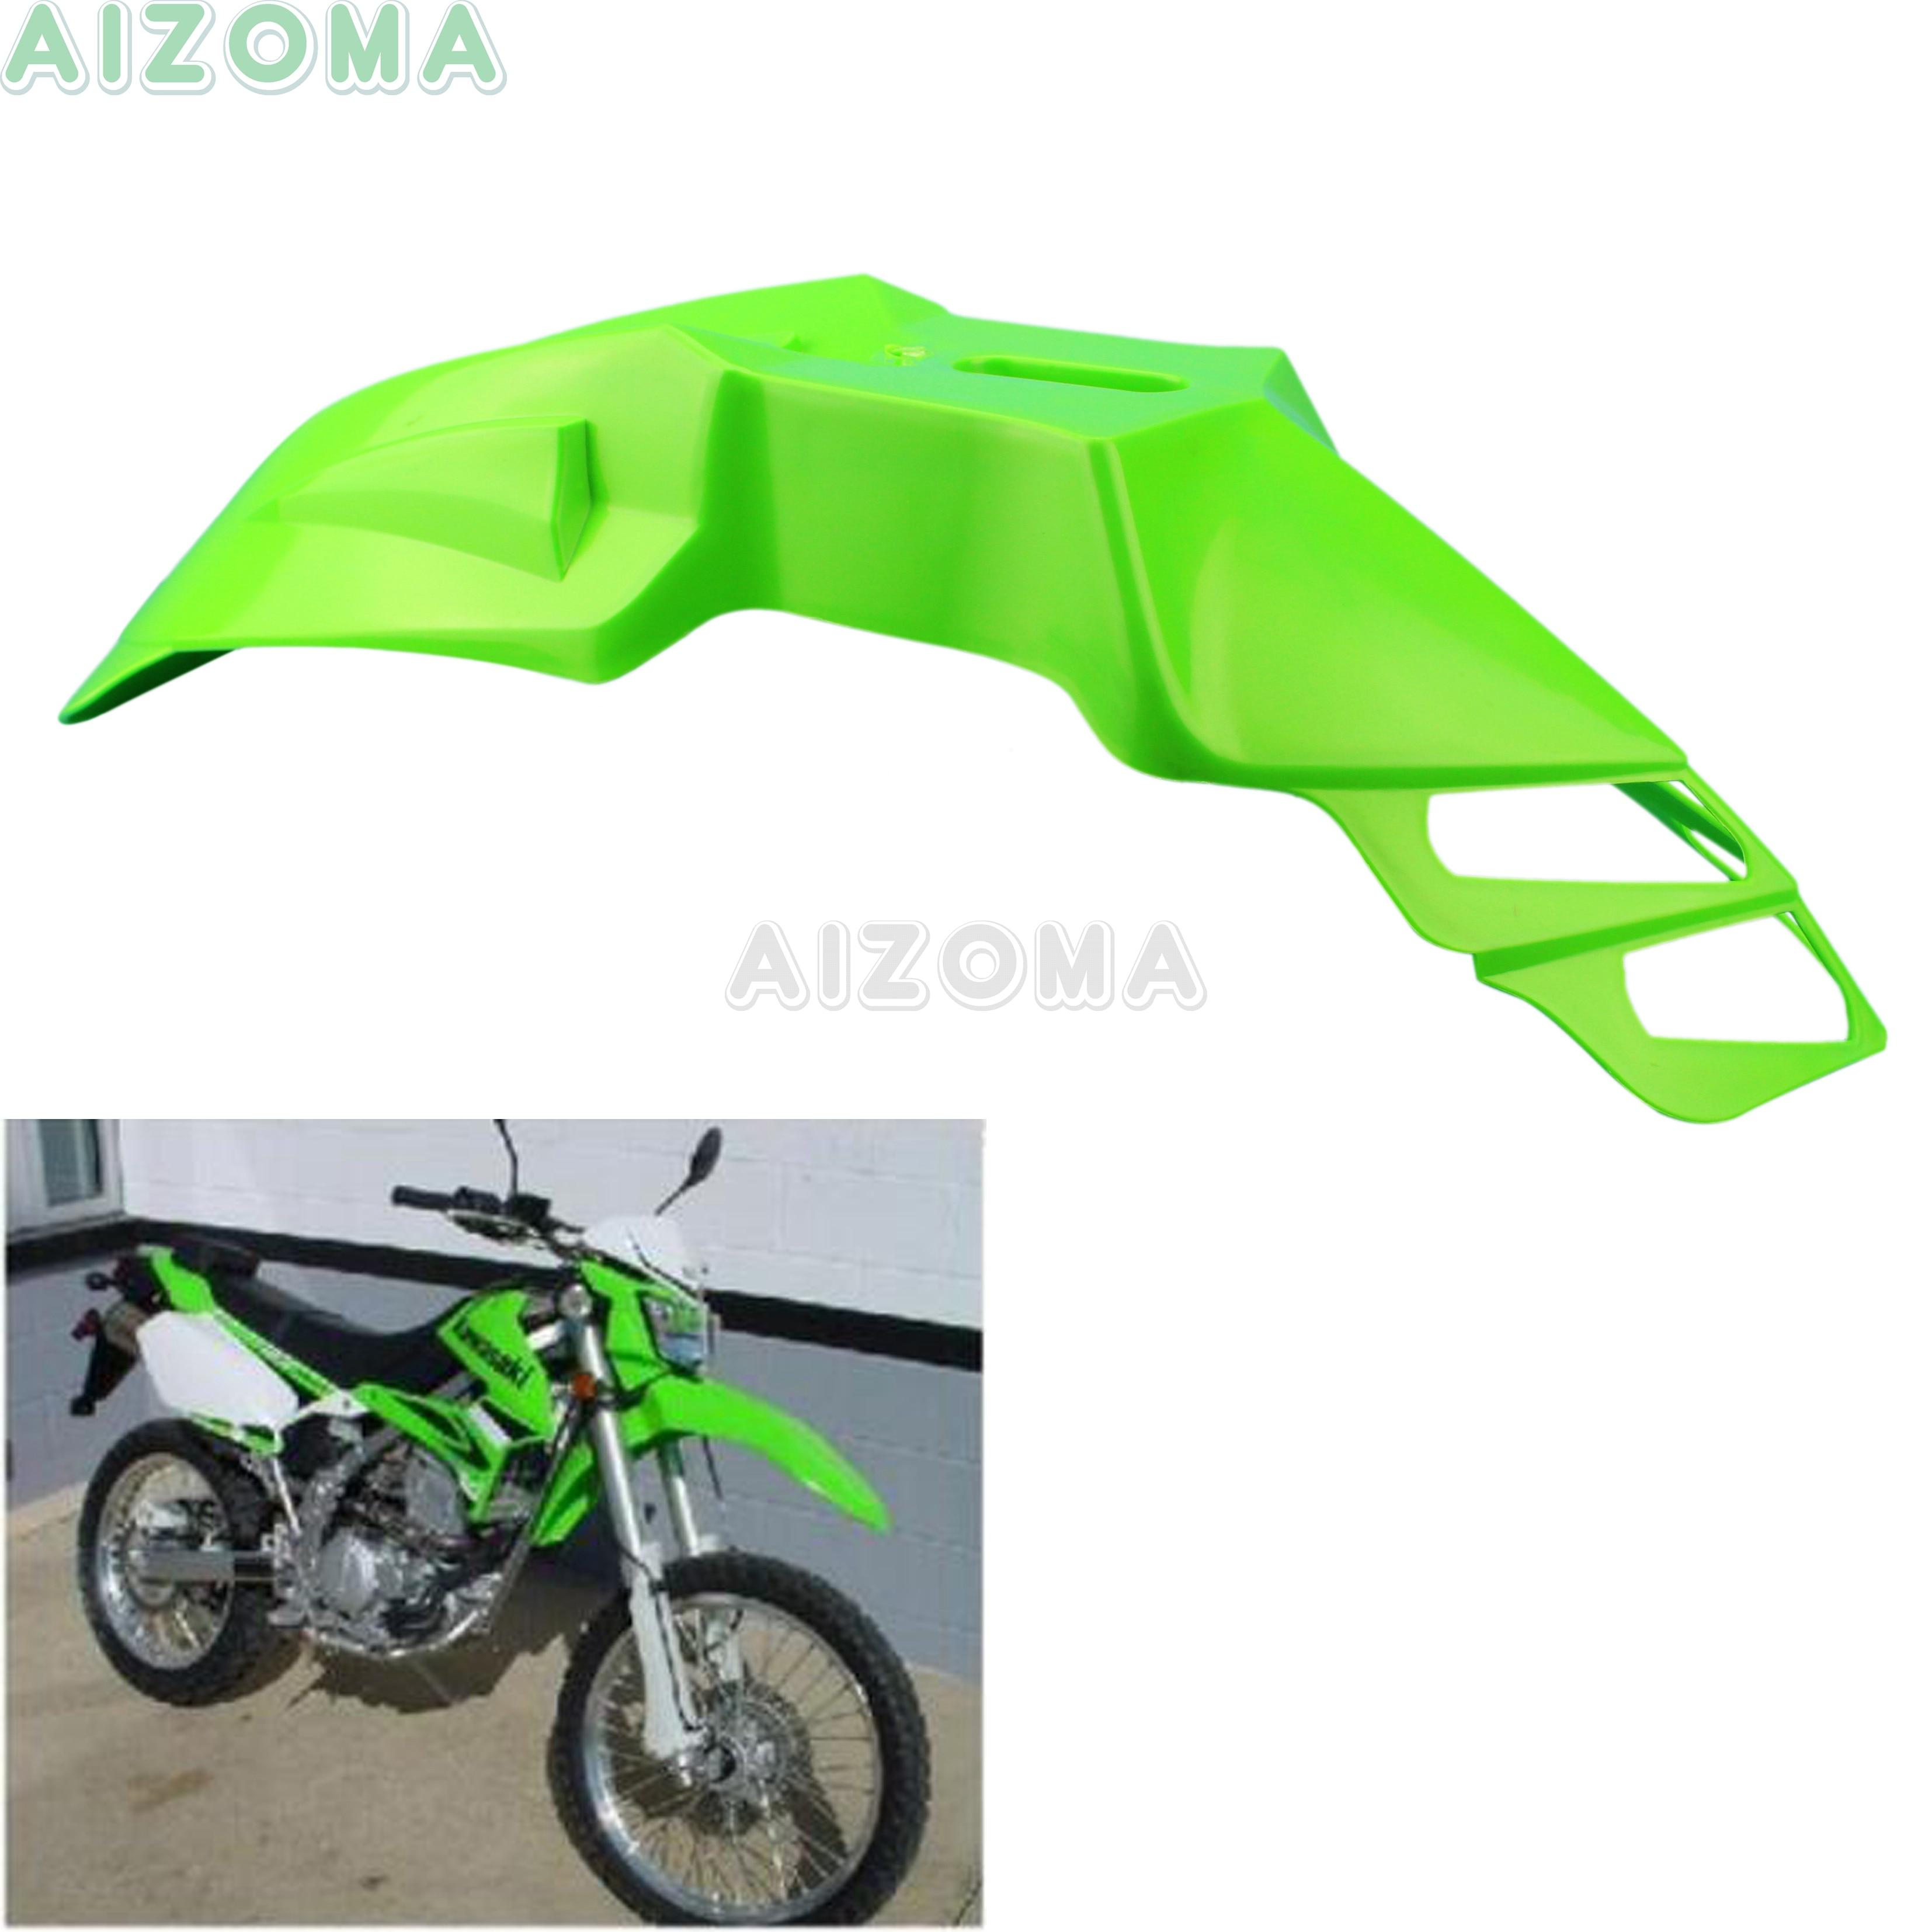 Universal Motorcycle Gripper Seat Cover Rubber Soft Skin Covers For K.T.M Suzuki Yamaha Kawasaki Honda SX CRF KXF RM YZ YZF KLX 125 250 150 200 250 350 450 Dirt Pit Bike Off Road Blue